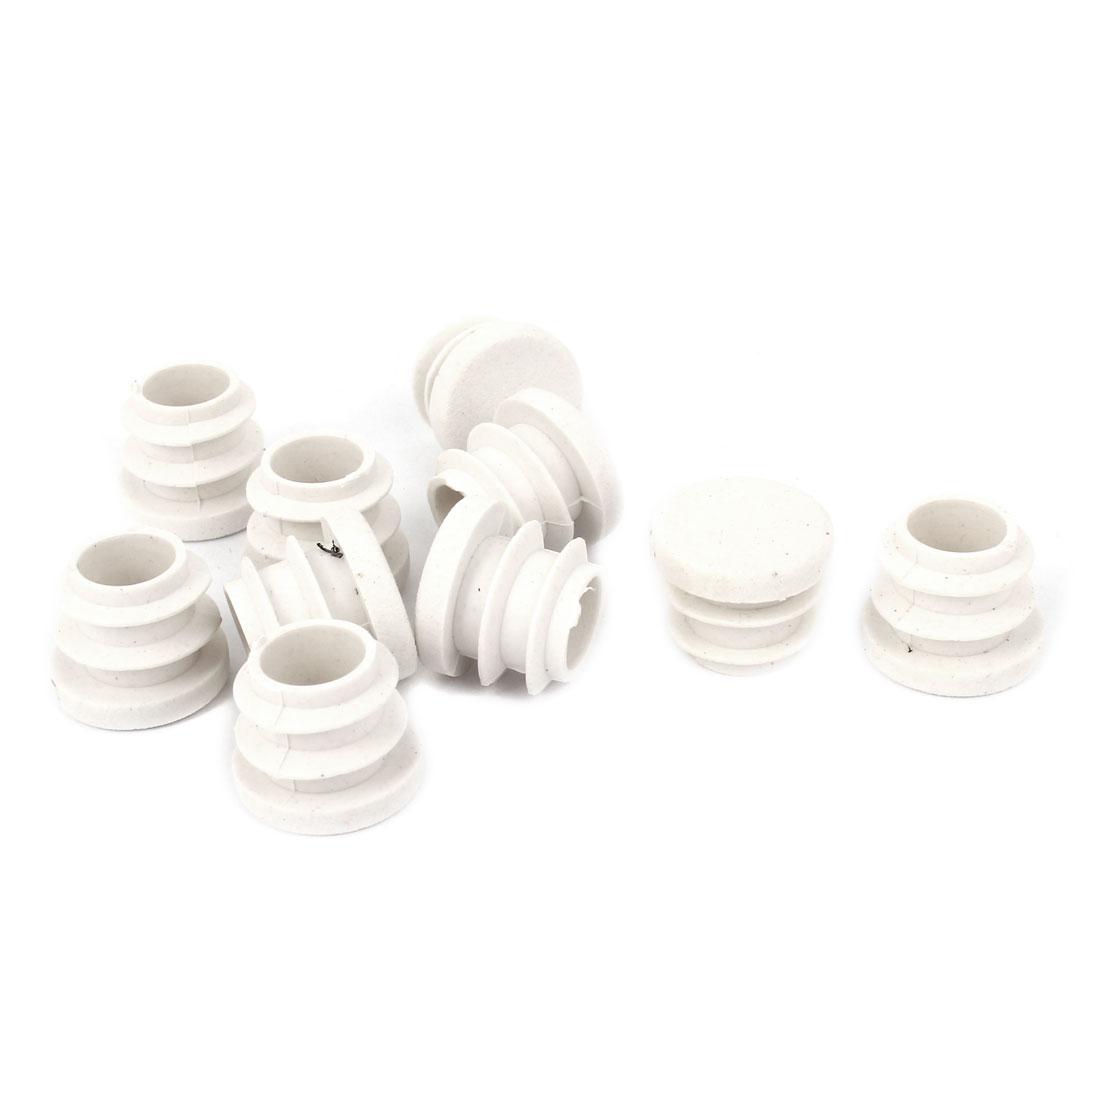 15mm Dia White Plastic Blanking End Cap Caps Tube Pipe Inserts Bung 10 Pcs